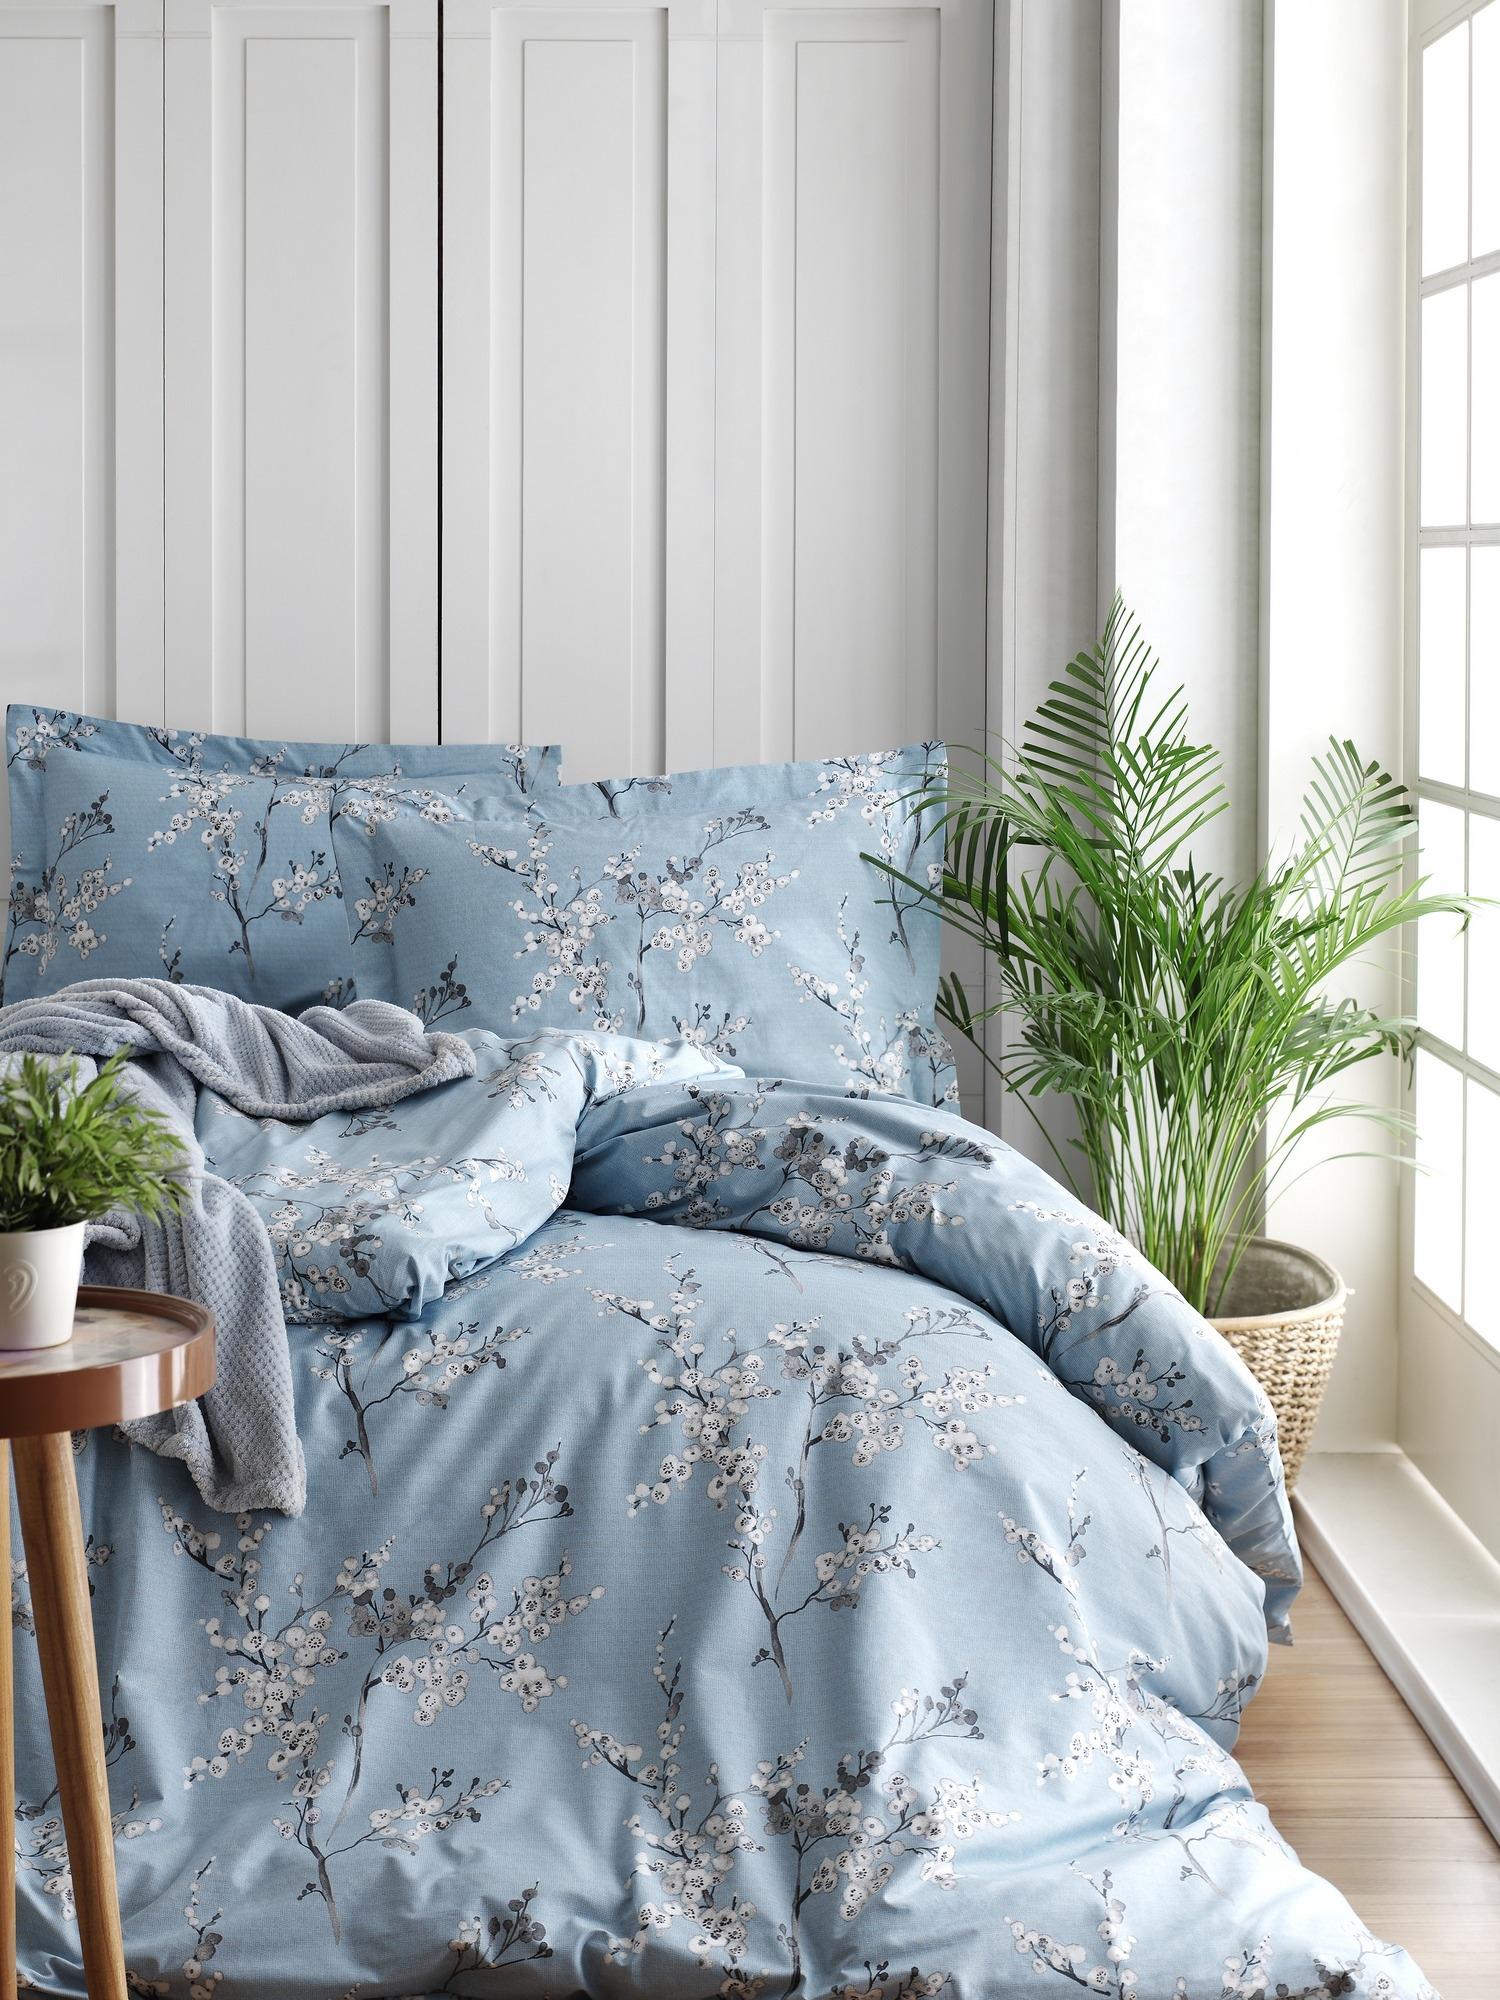 Lenjerie de pat din bumbac Ranforce, Chicory Albastru / Alb, 200 x 220 cm poza